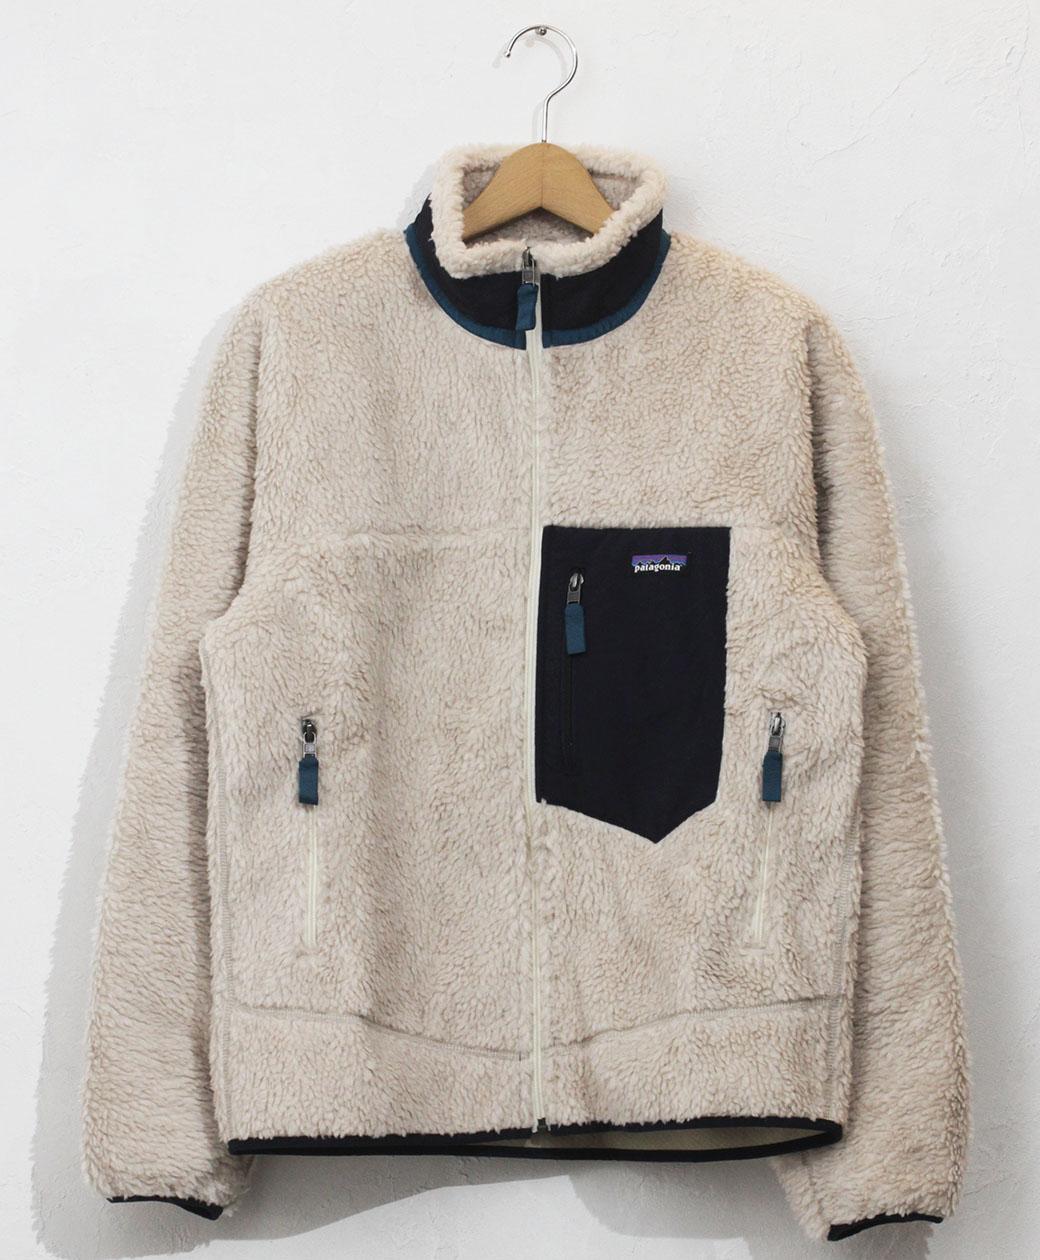 patagonia M's Classic Retro X Jacket(Natural)